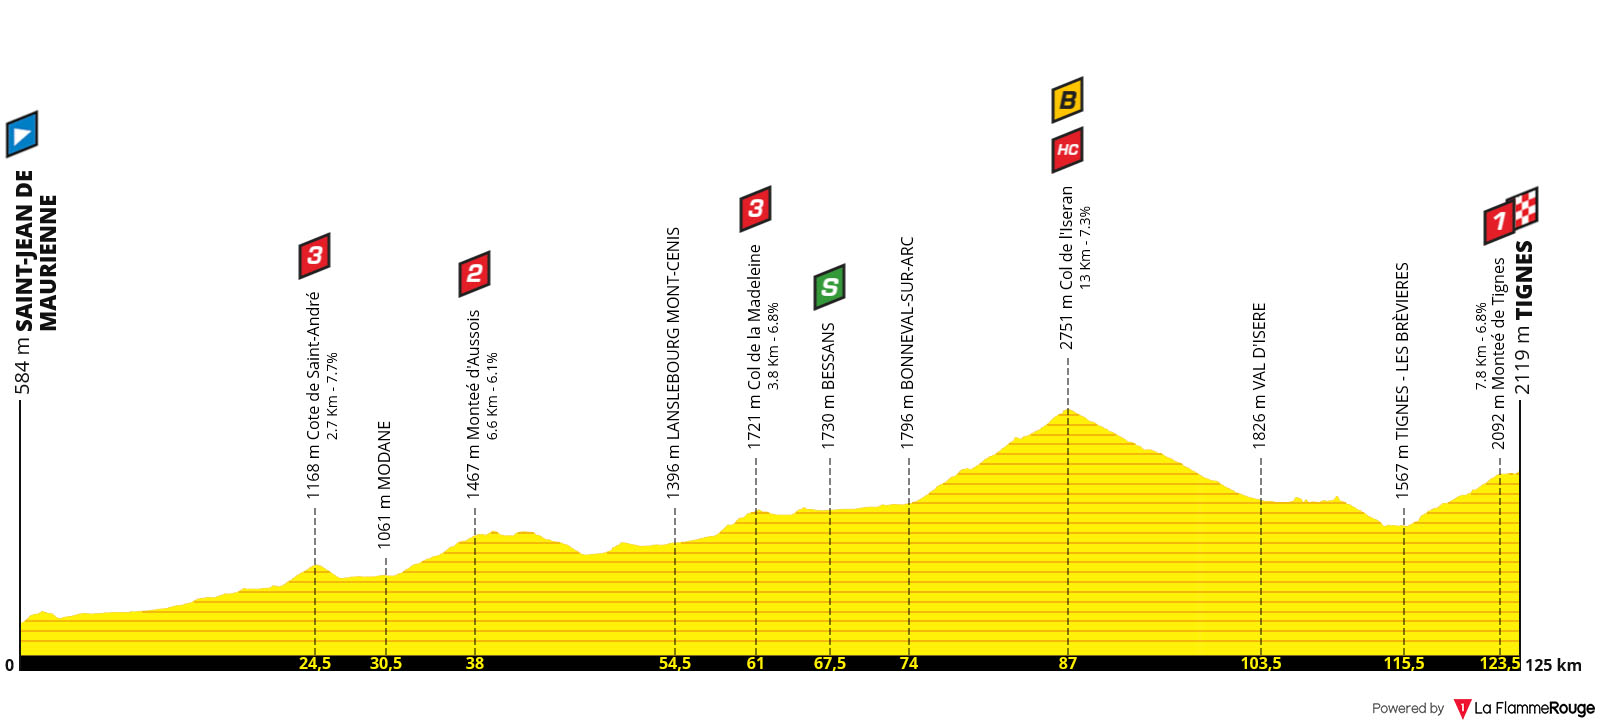 Perfil Etapa 19 - Tour de Francia 2019